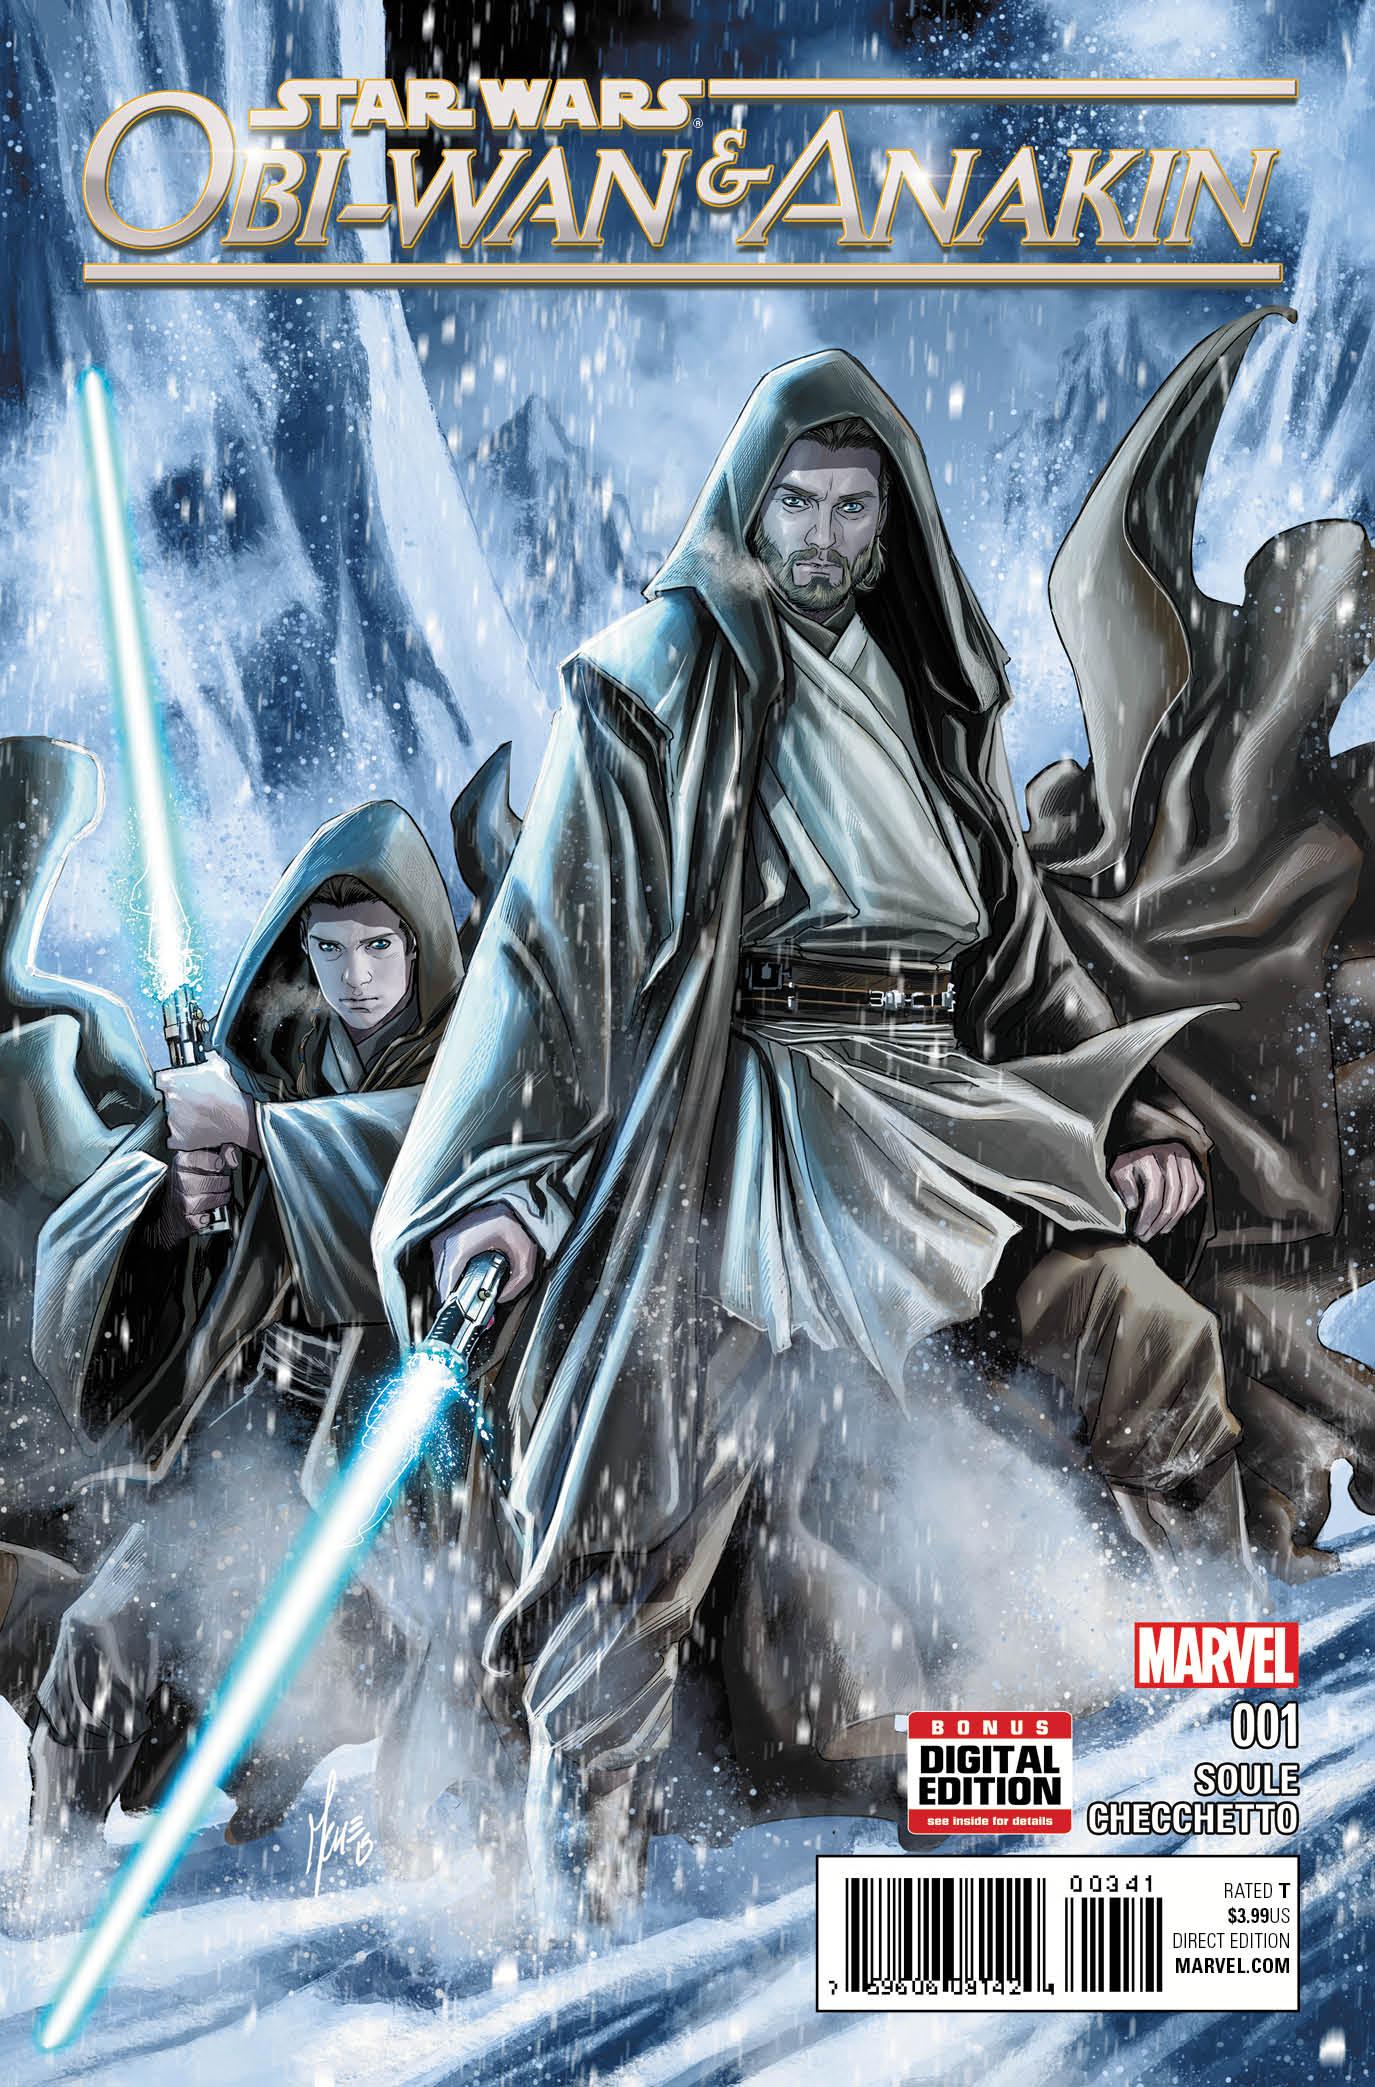 OBI-WAN AND ANAKIN #1 Unites Master & Padawan For An Epic New Adventure!